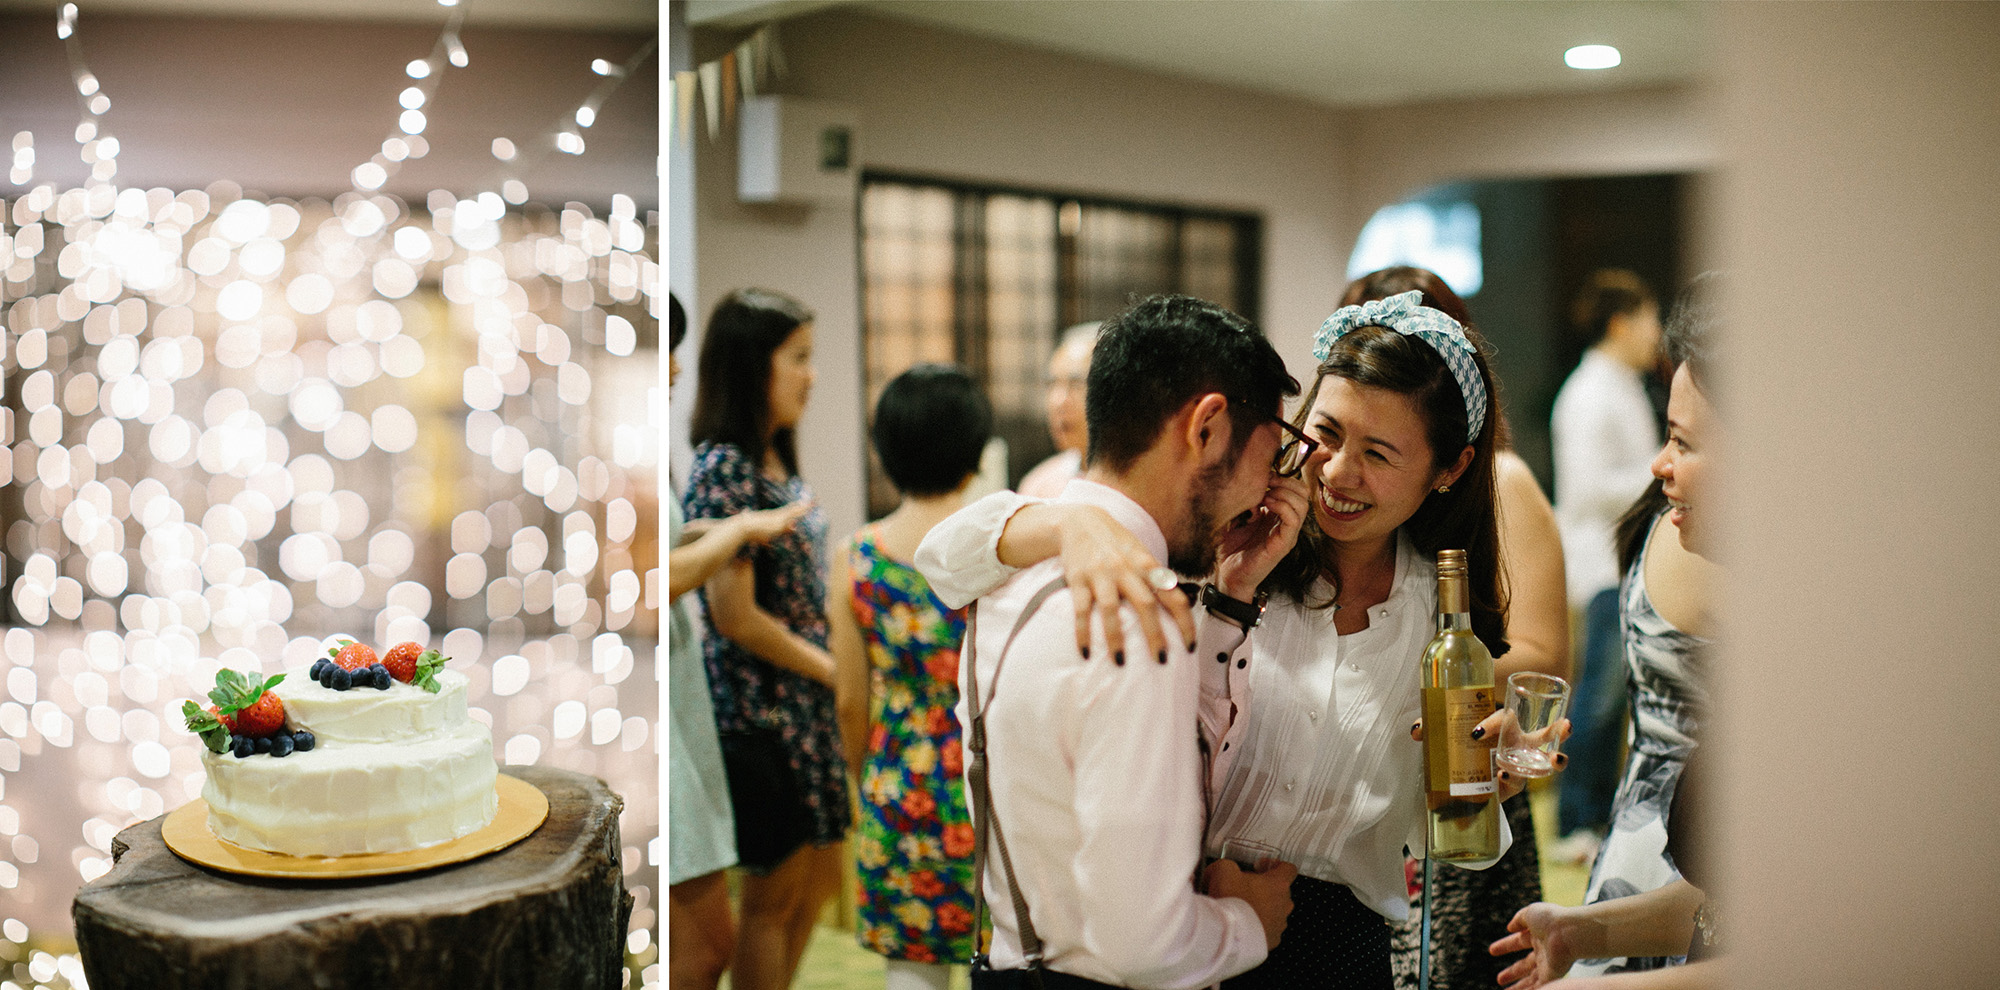 103-hellojanelee-sam grace-malaysia-wedding-day